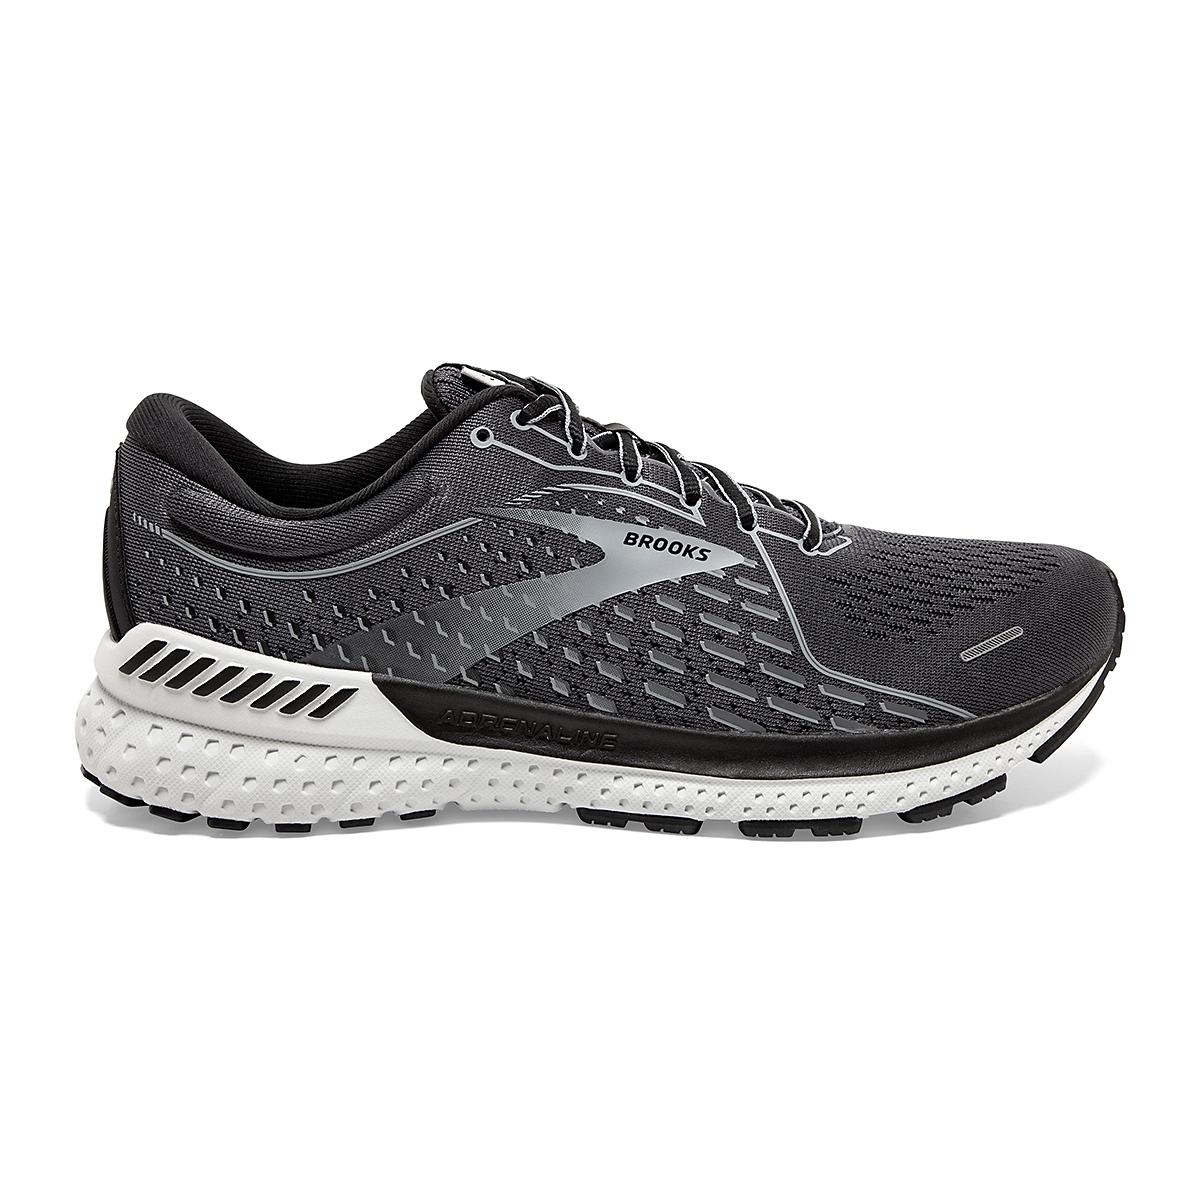 Men's Brooks Adrenaline GTS 21 Running Shoe - Color: Blackened Pearl - Size: 7 - Width: Regular, Blackened Pearl, large, image 1